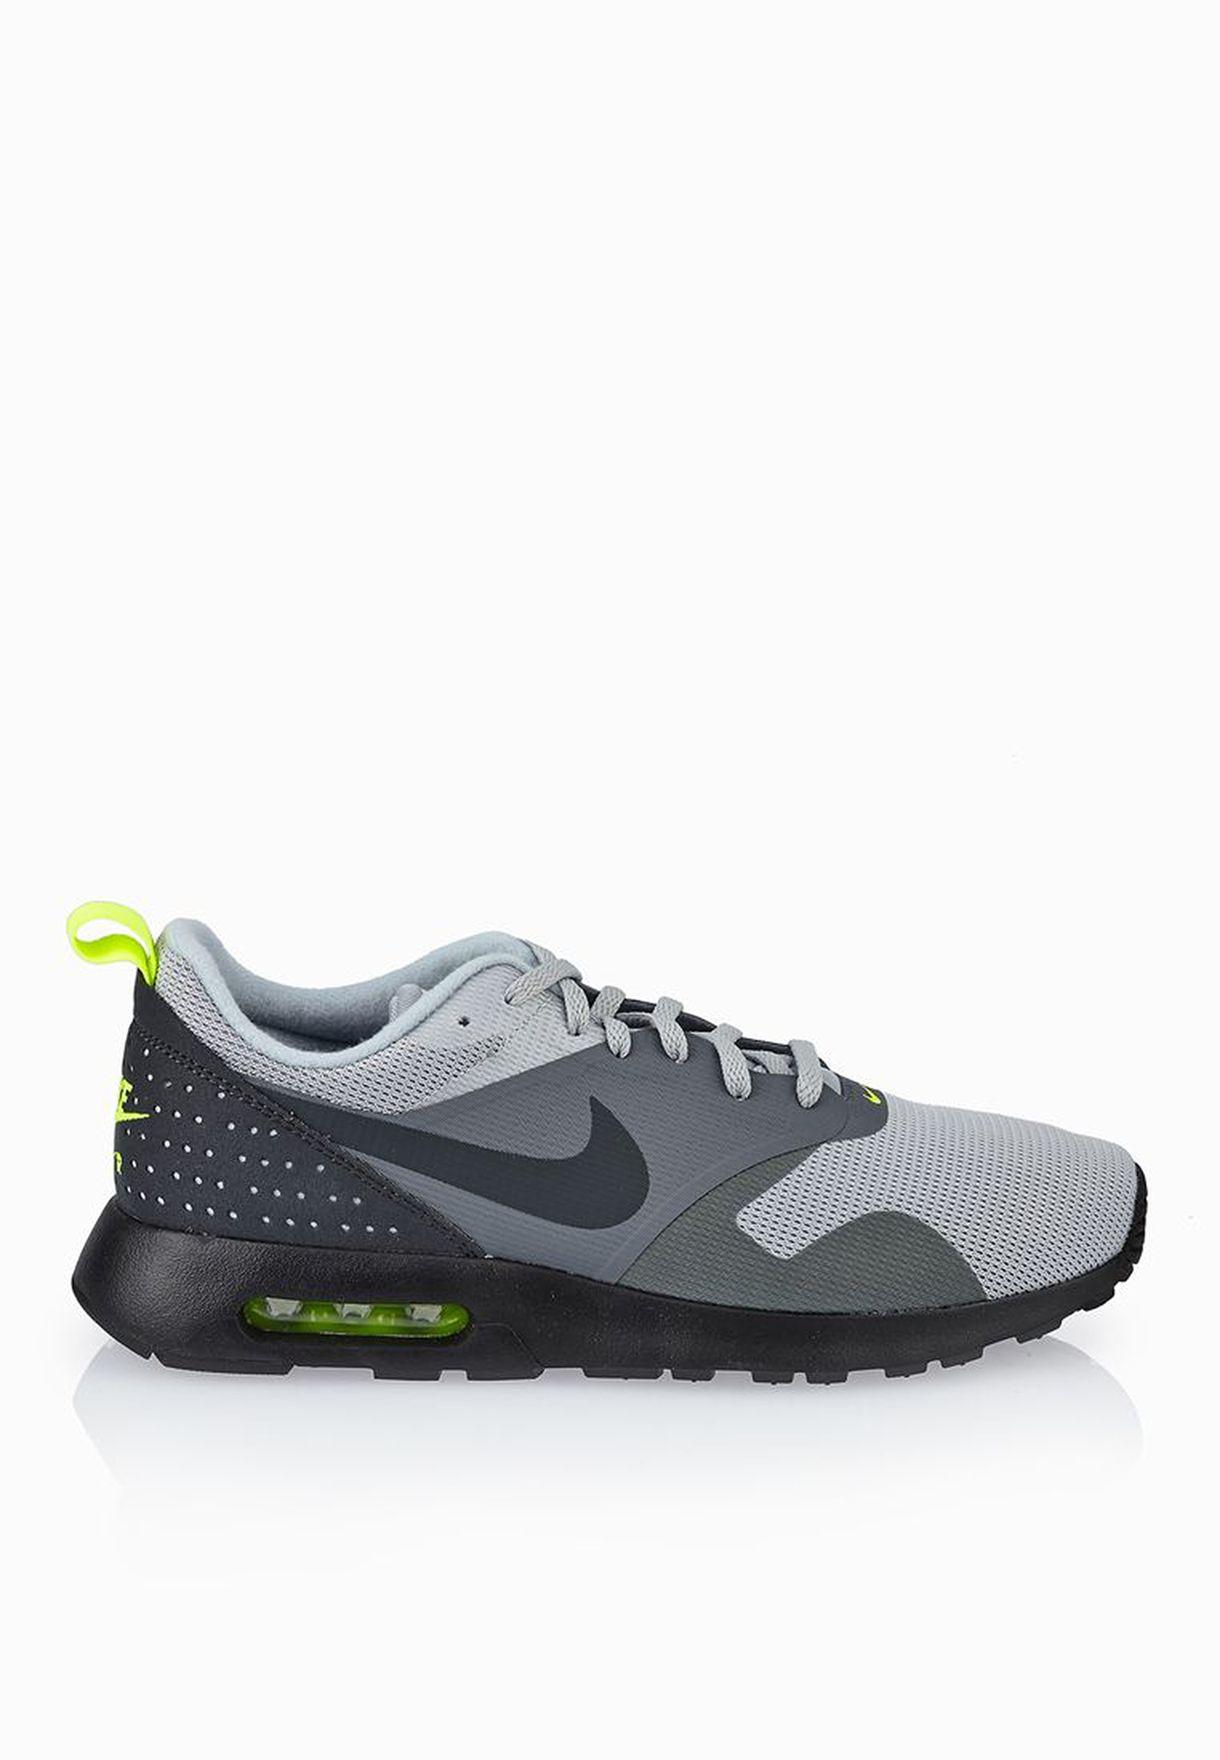 Nike 705149 Mens Air Max Tavas Low Top Running Athletic